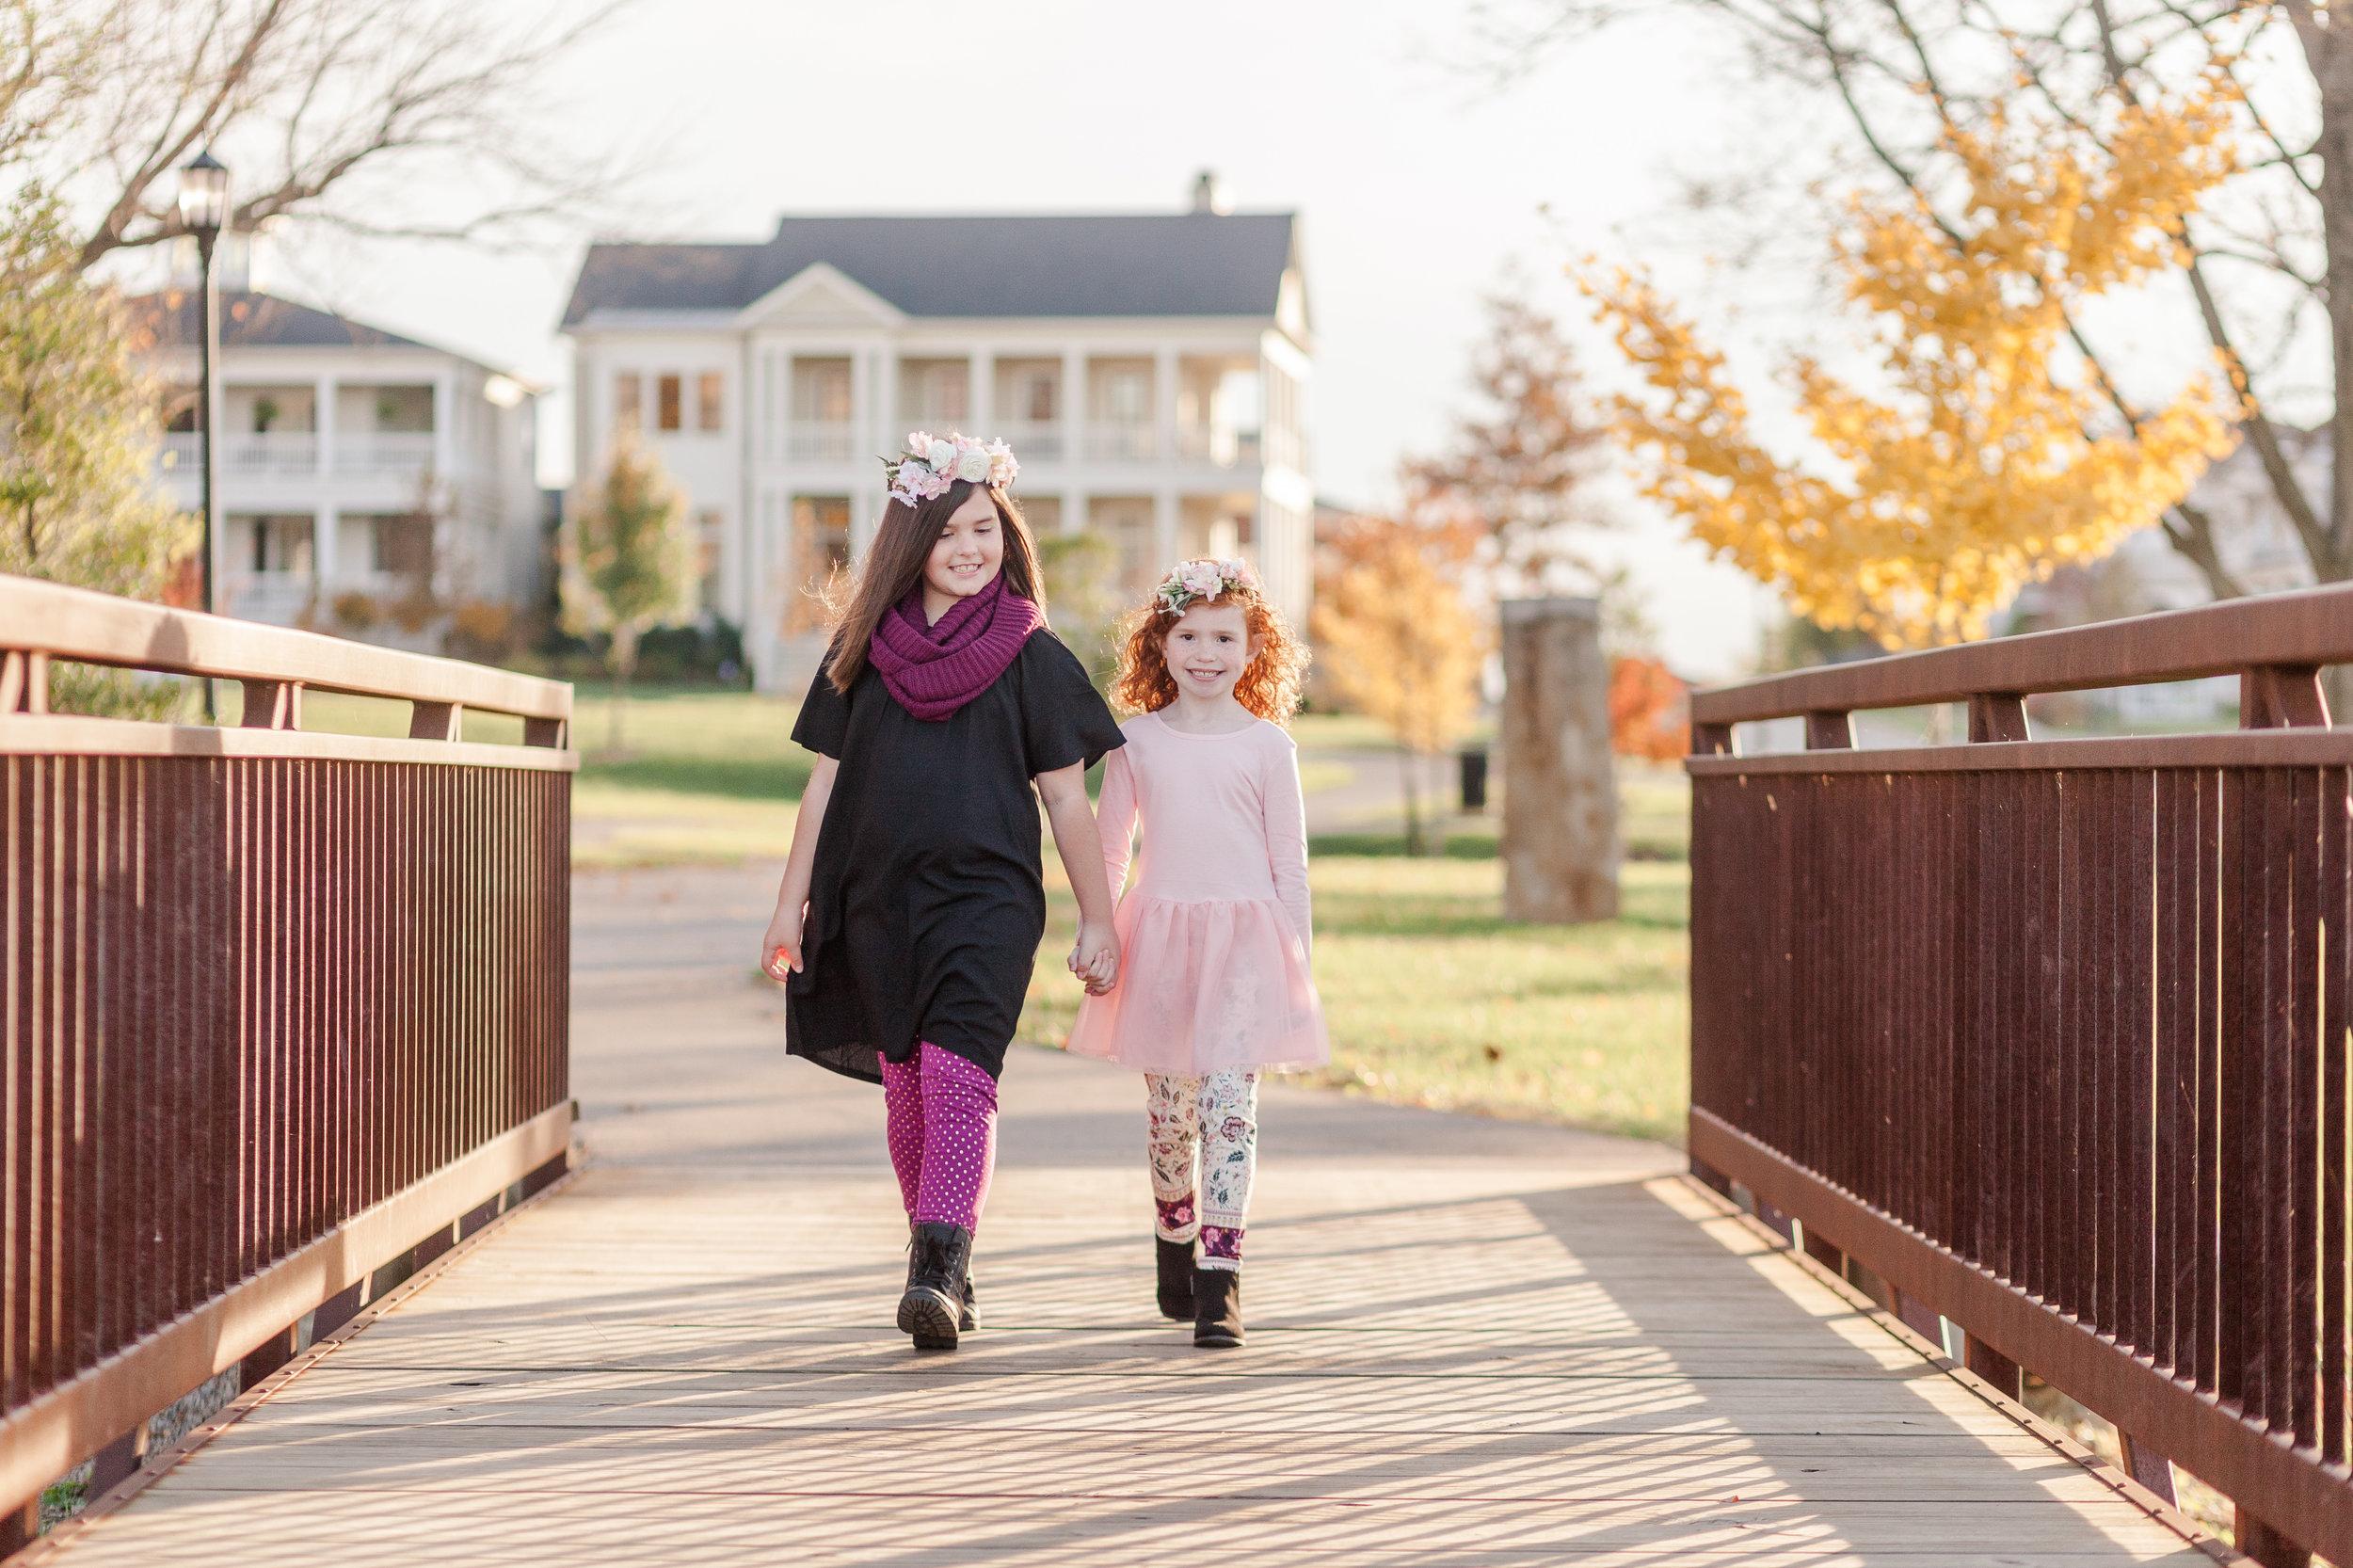 Sarah Mesa Photography | Augusta, GA Family and Wedding Photographer